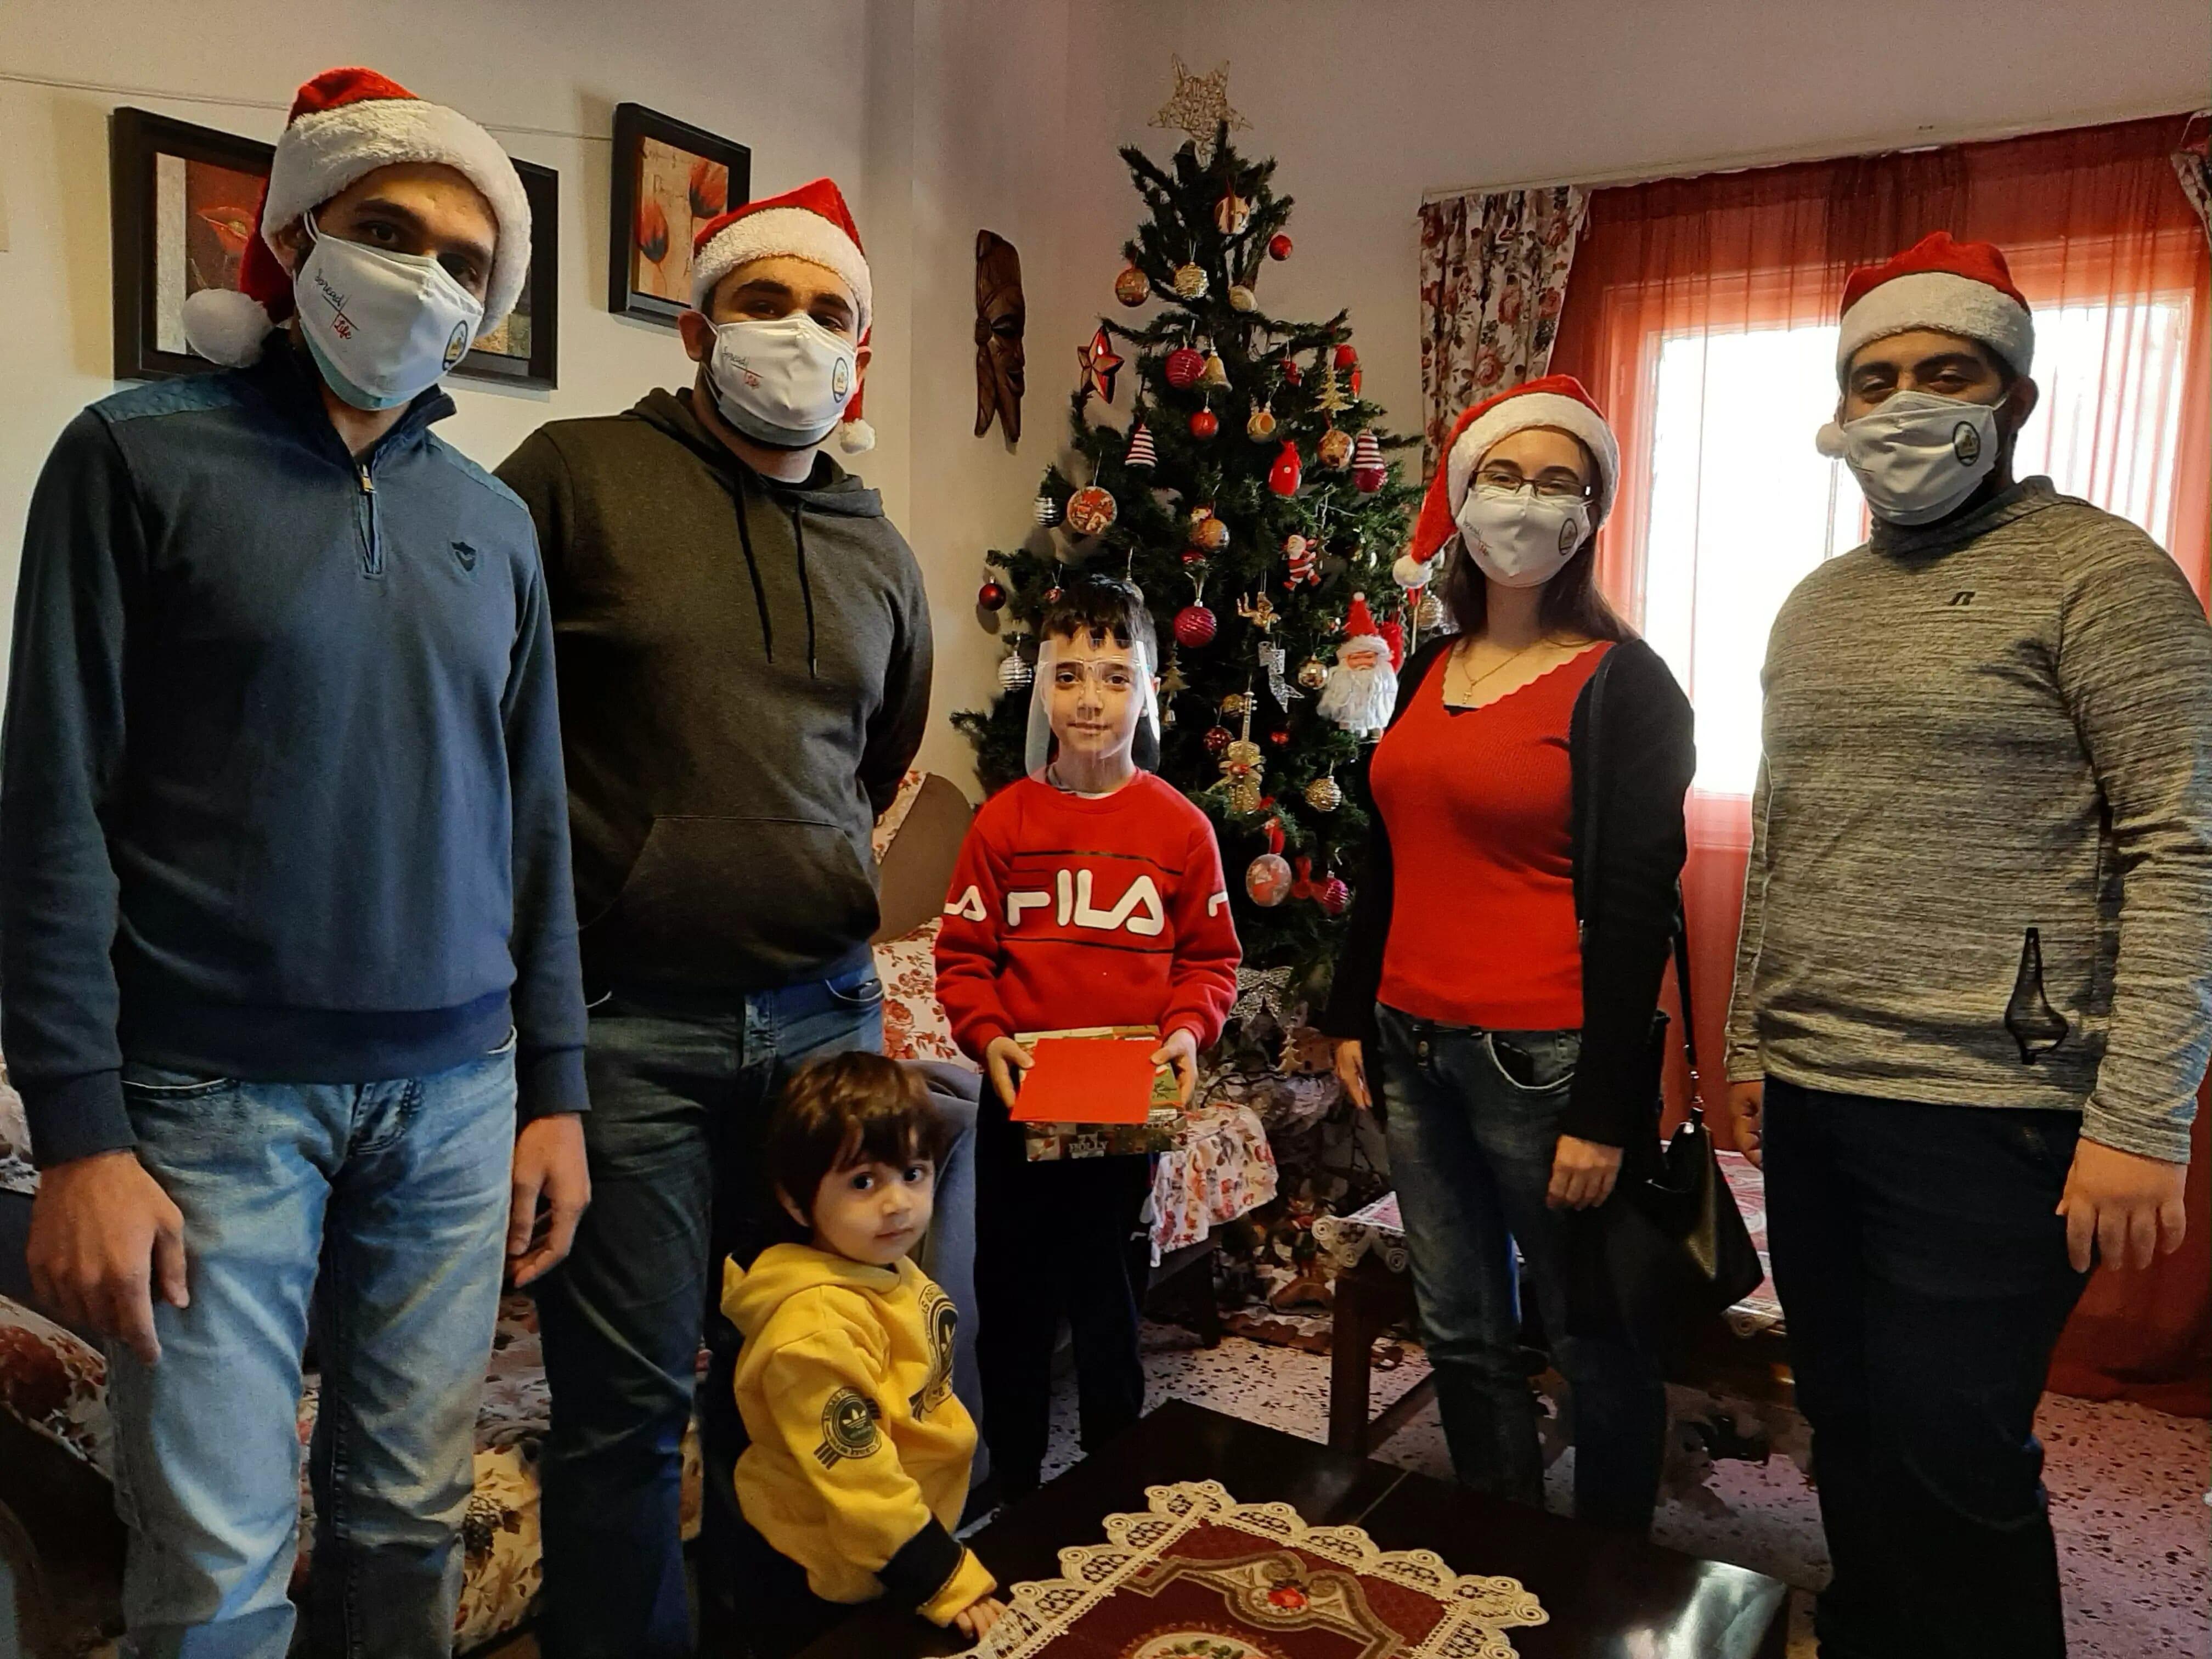 https://eundemia.sirv.com/Images/christmas/456810.webp